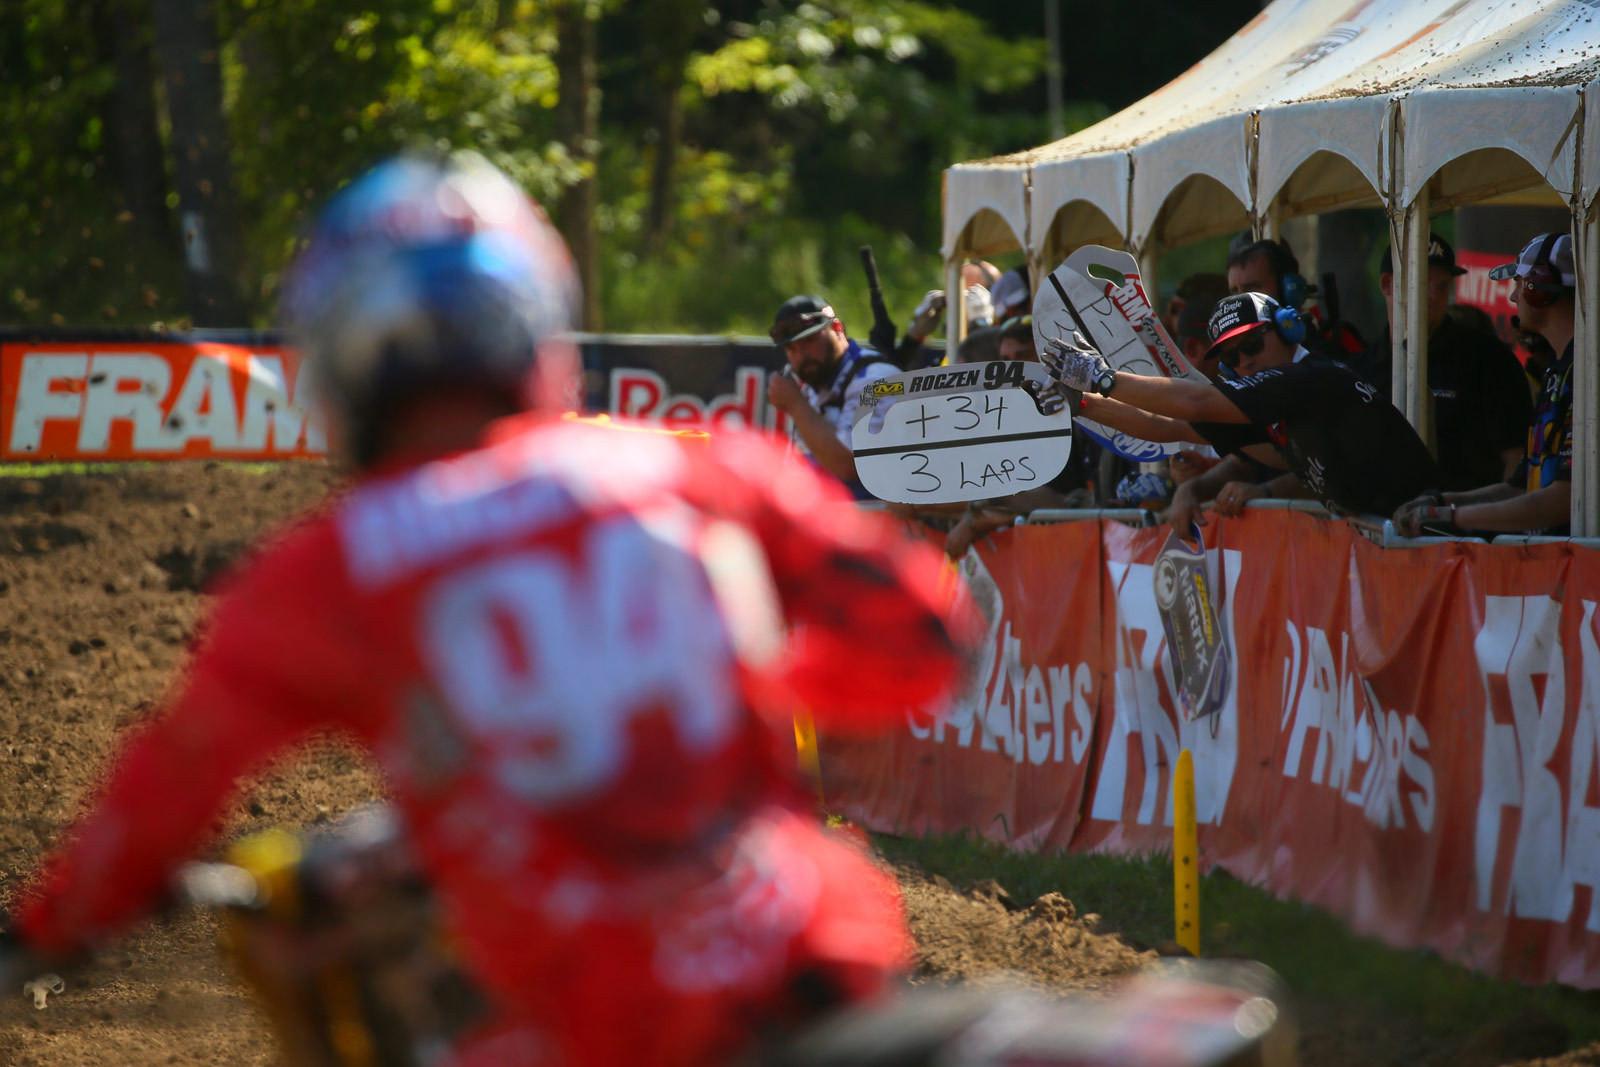 Ken Roczen - Photo Blast: Ironman - Motocross Pictures - Vital MX